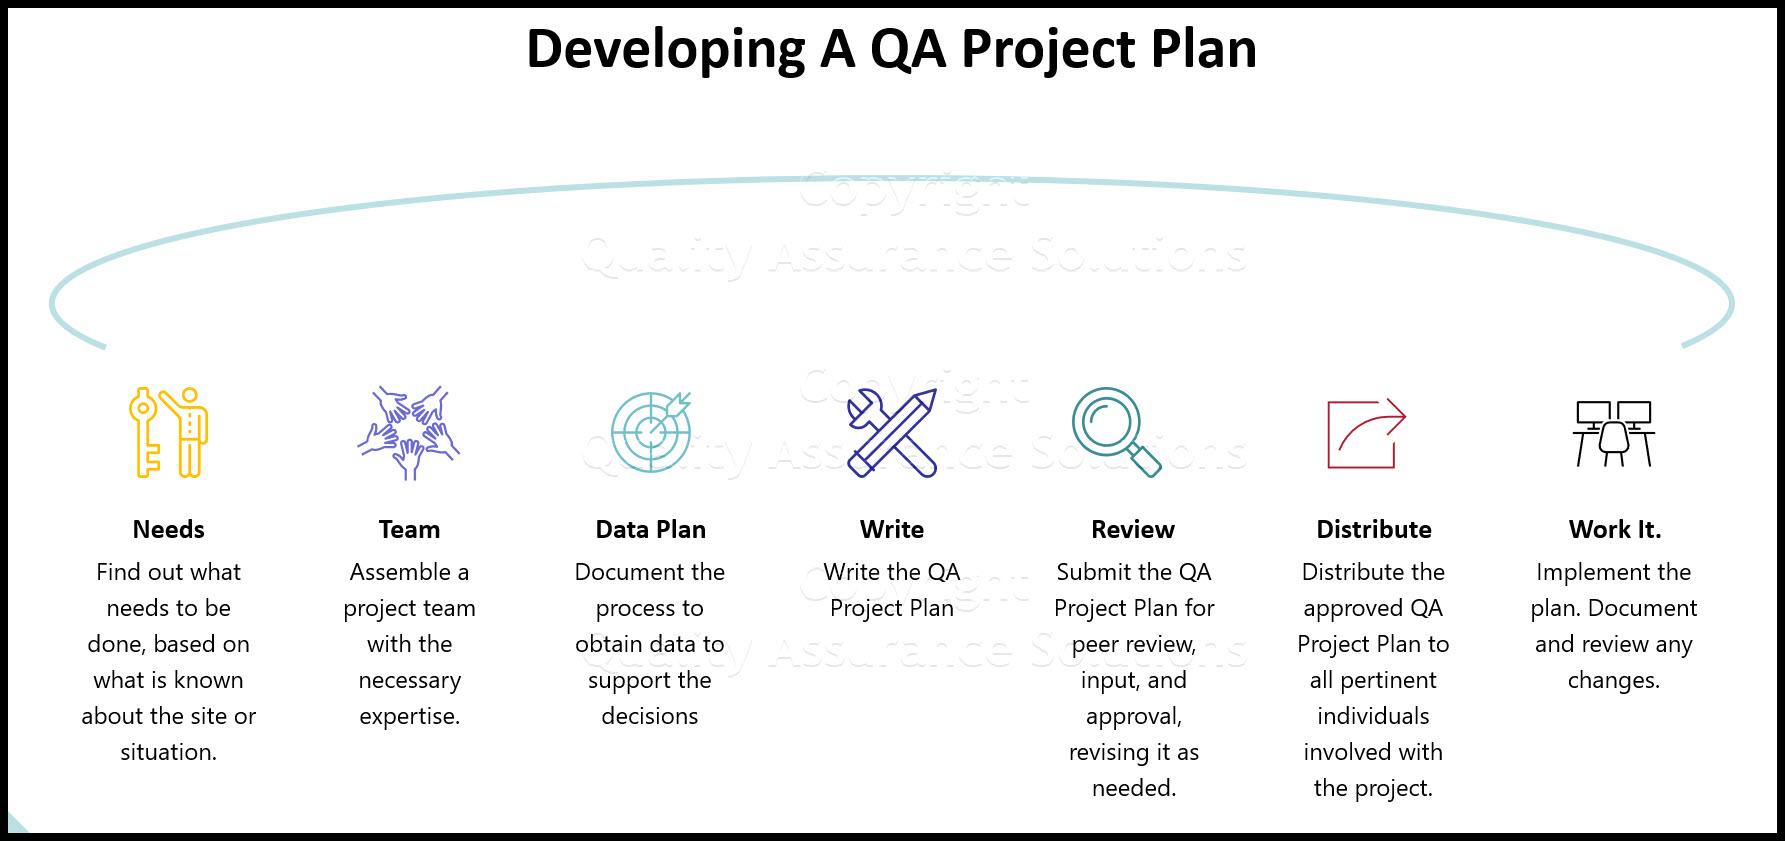 QA Project Plan business slide